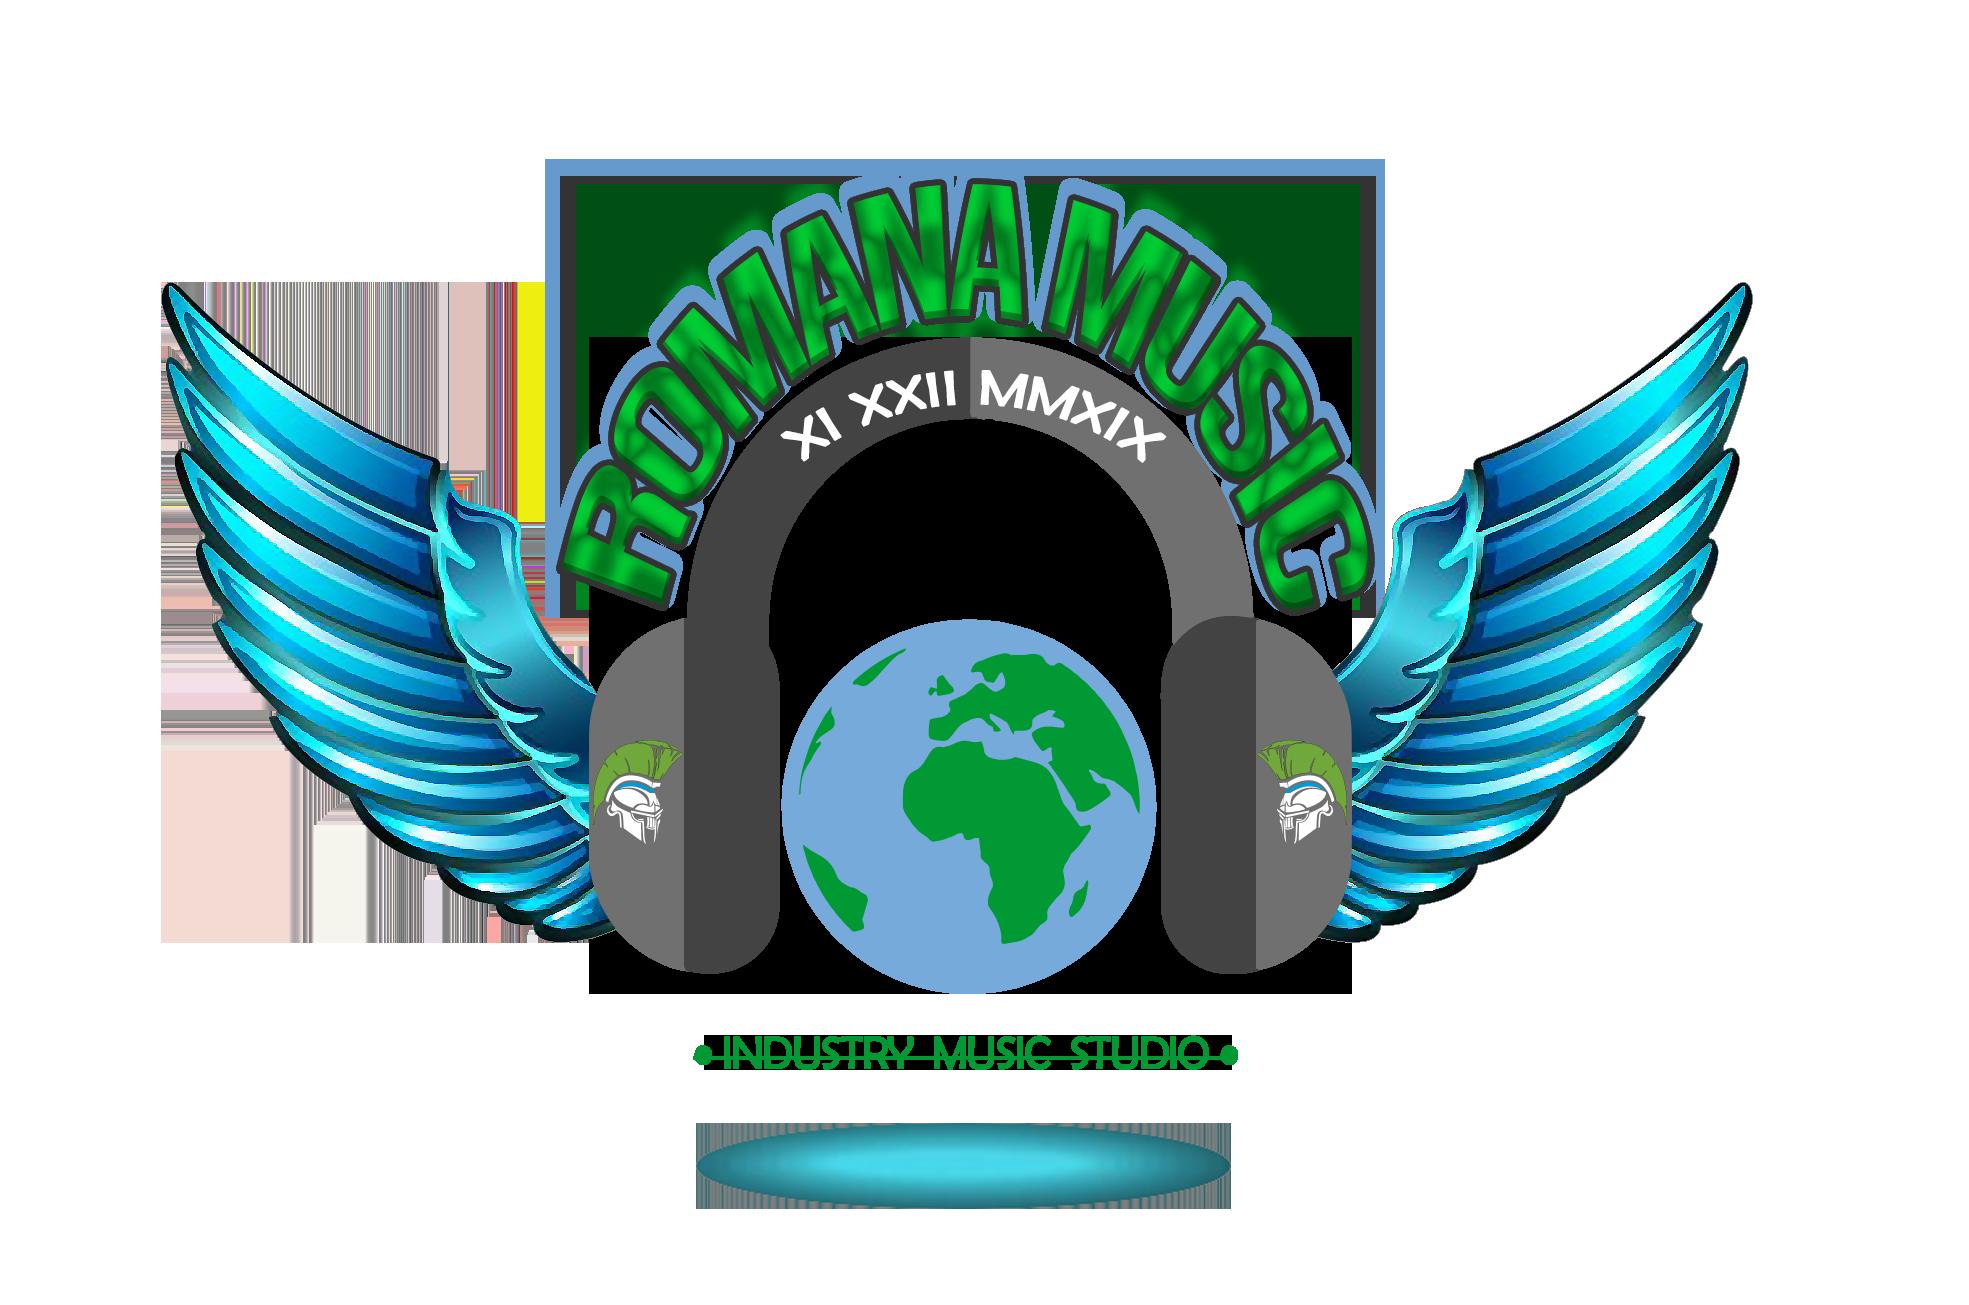 Romana Music Industry, LLC